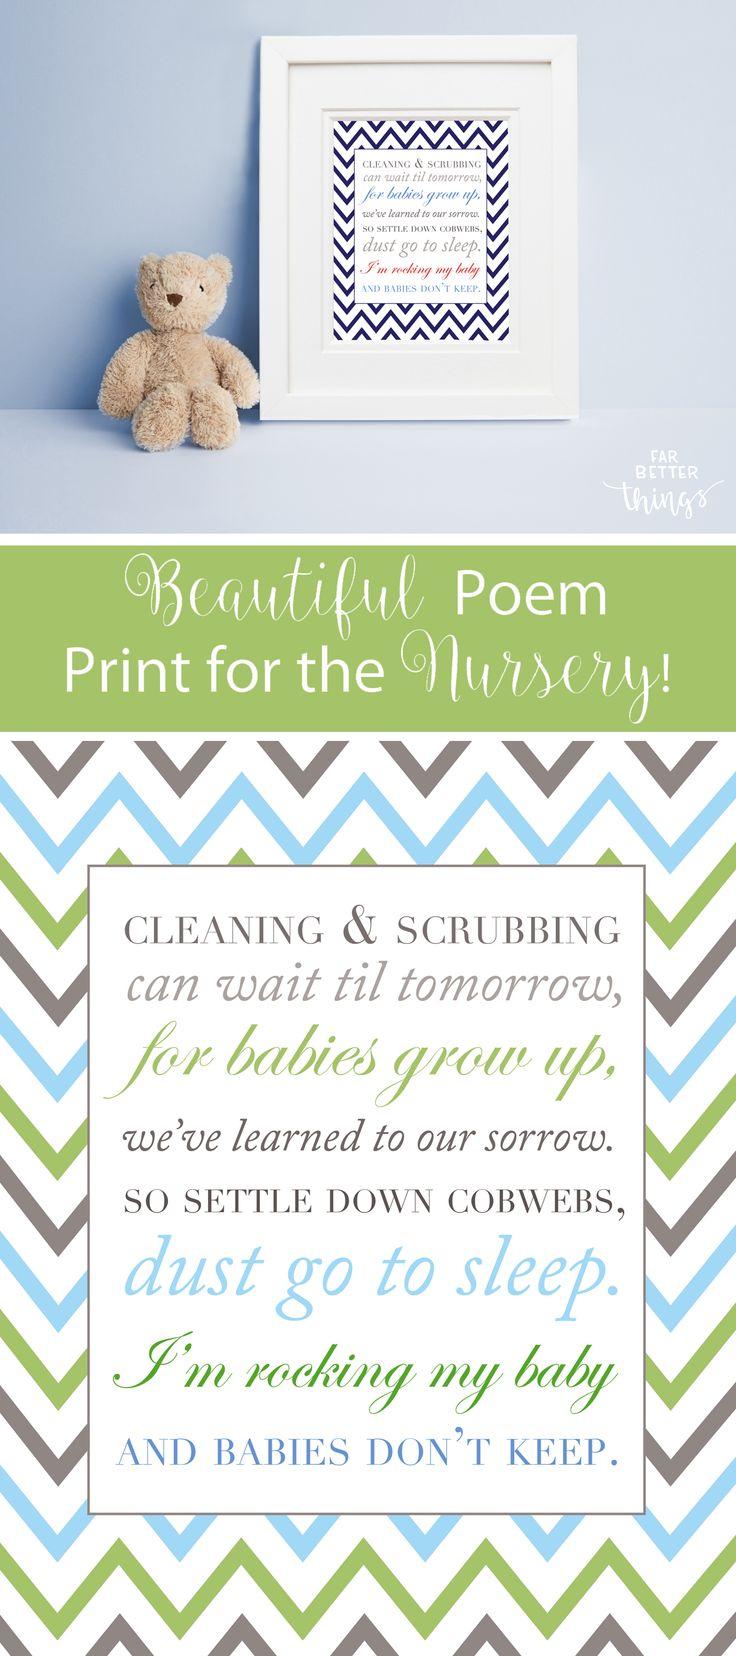 Babies Don't Keep - Nursery Art - Nursery Poem - Chevron Nursery Art - Nursery Print - Custom Nursery Art - Baby Shower Gift - Nursery Decor by Far Better Things on Etsy